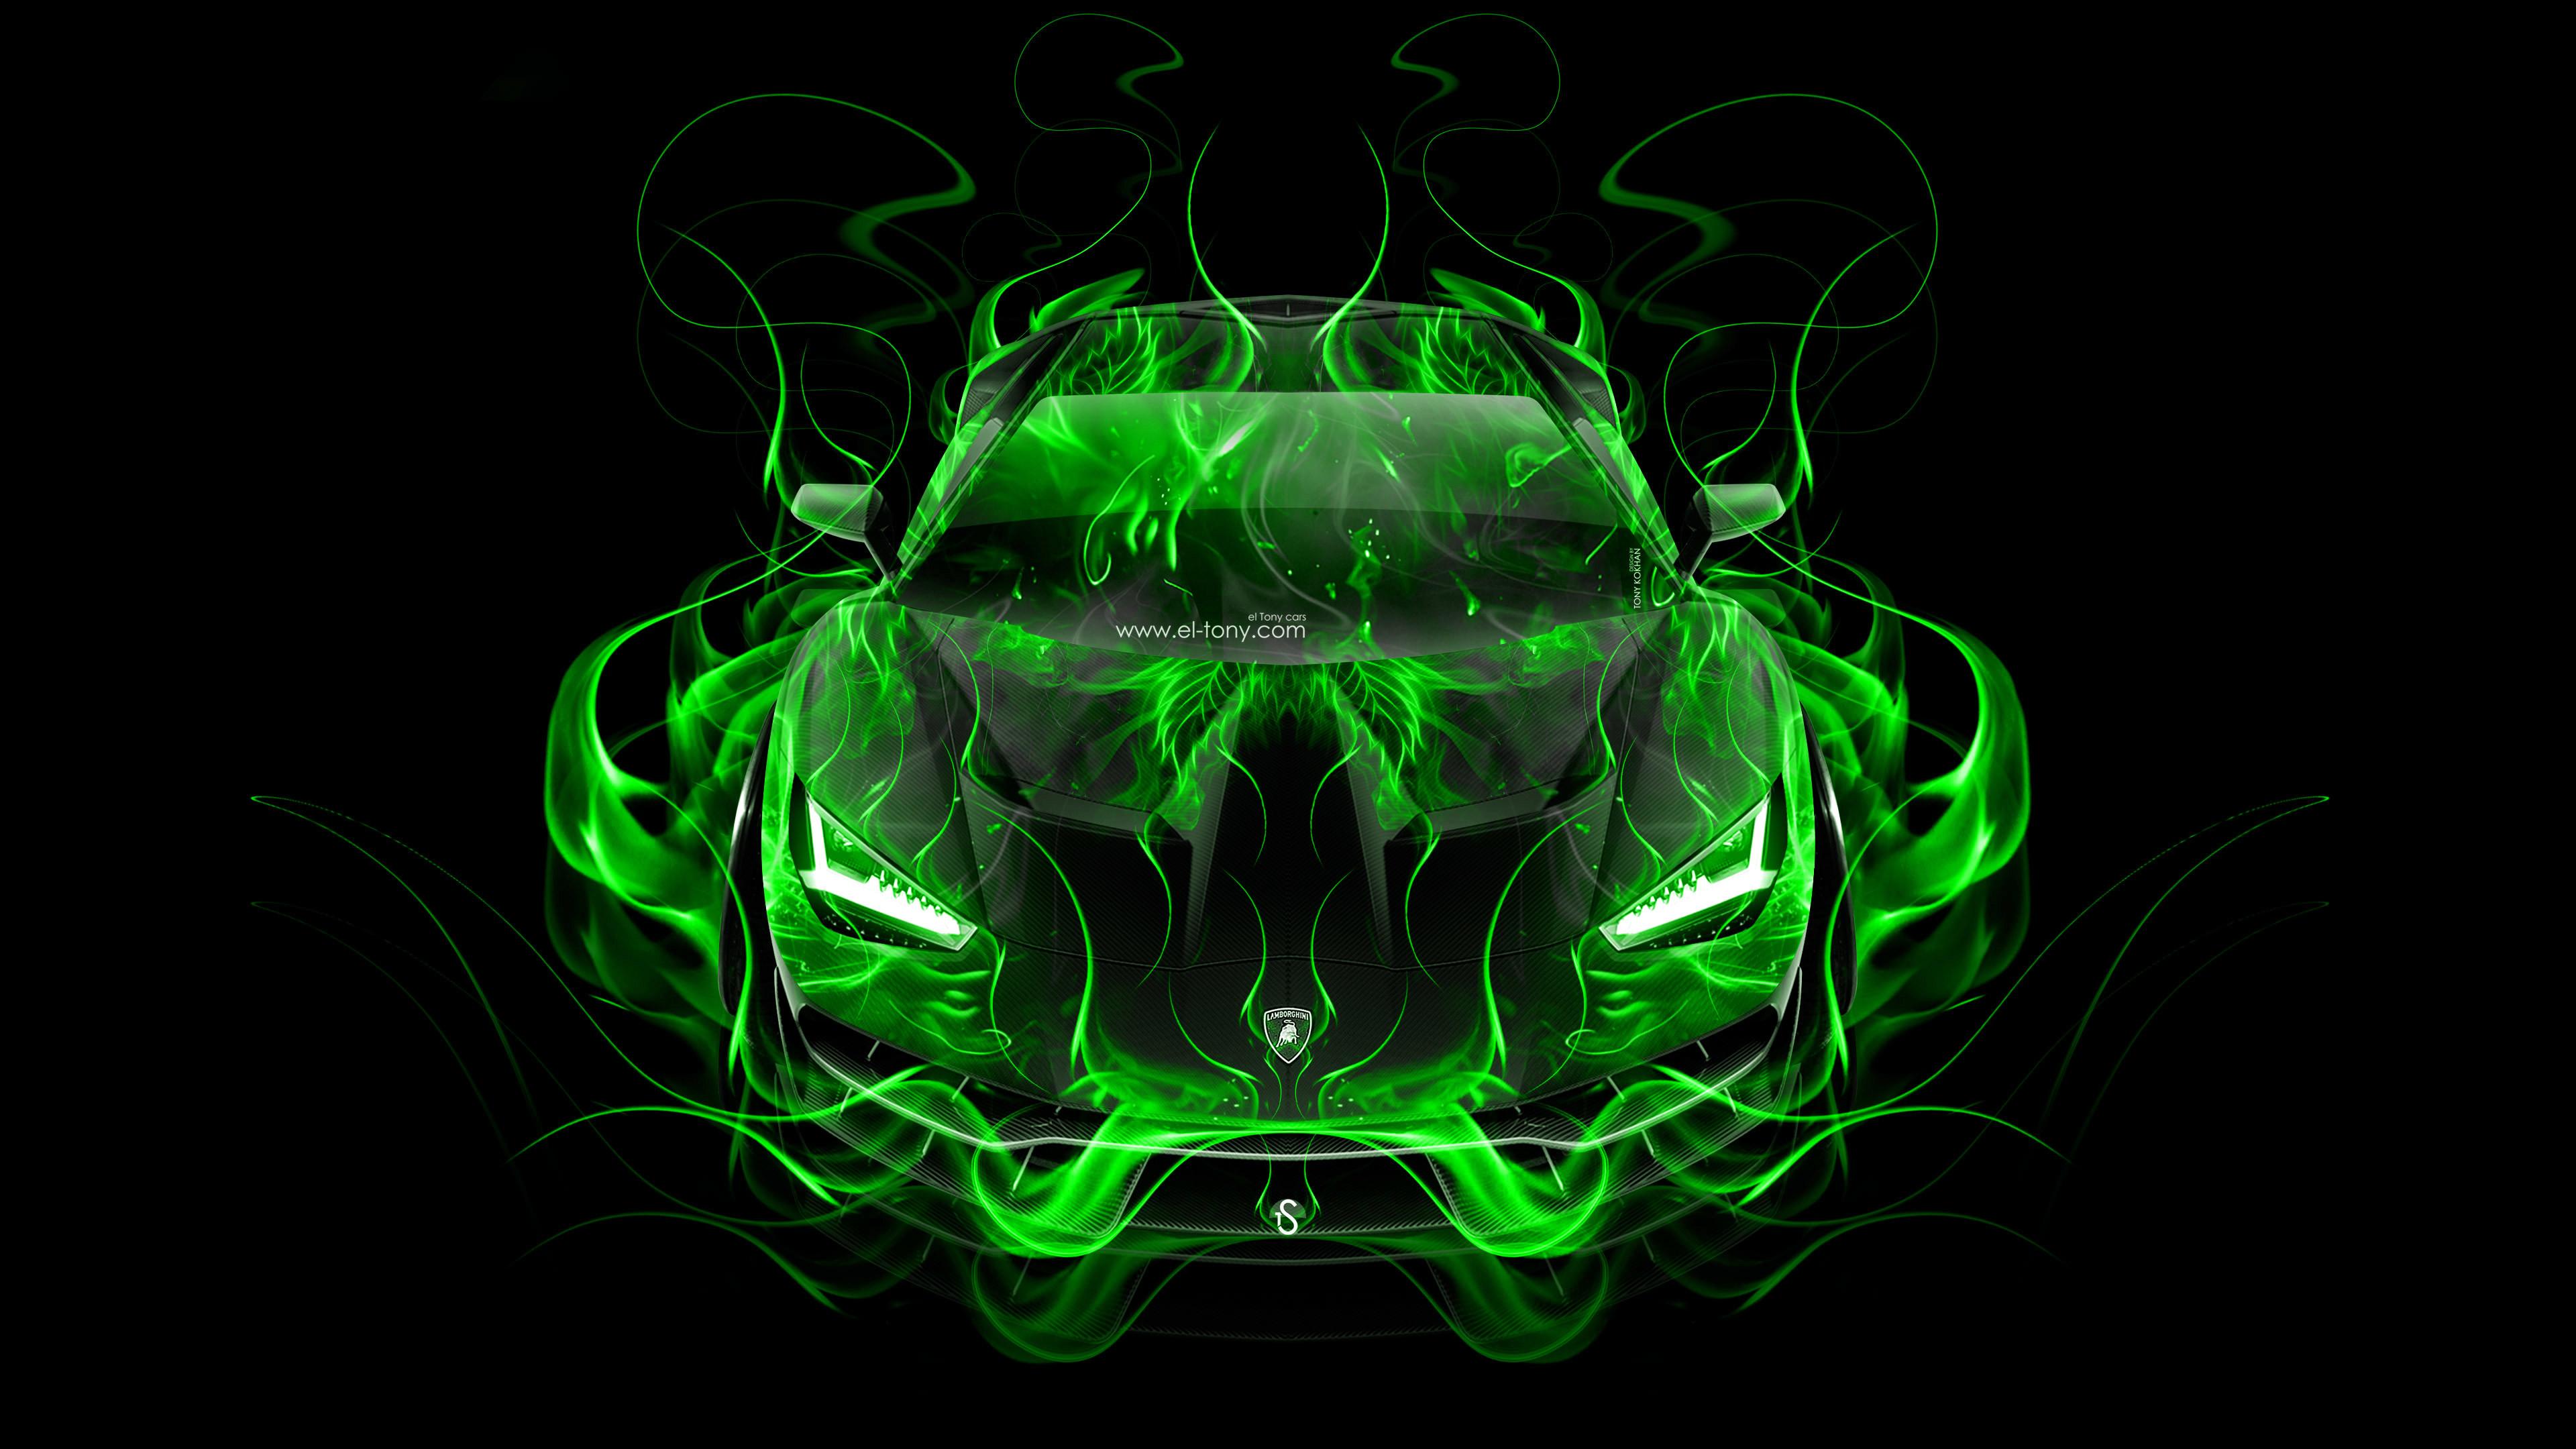 … Lamborghini-Centenario-FrontUp-Super-Fire-Flame-Abstract-Car- …